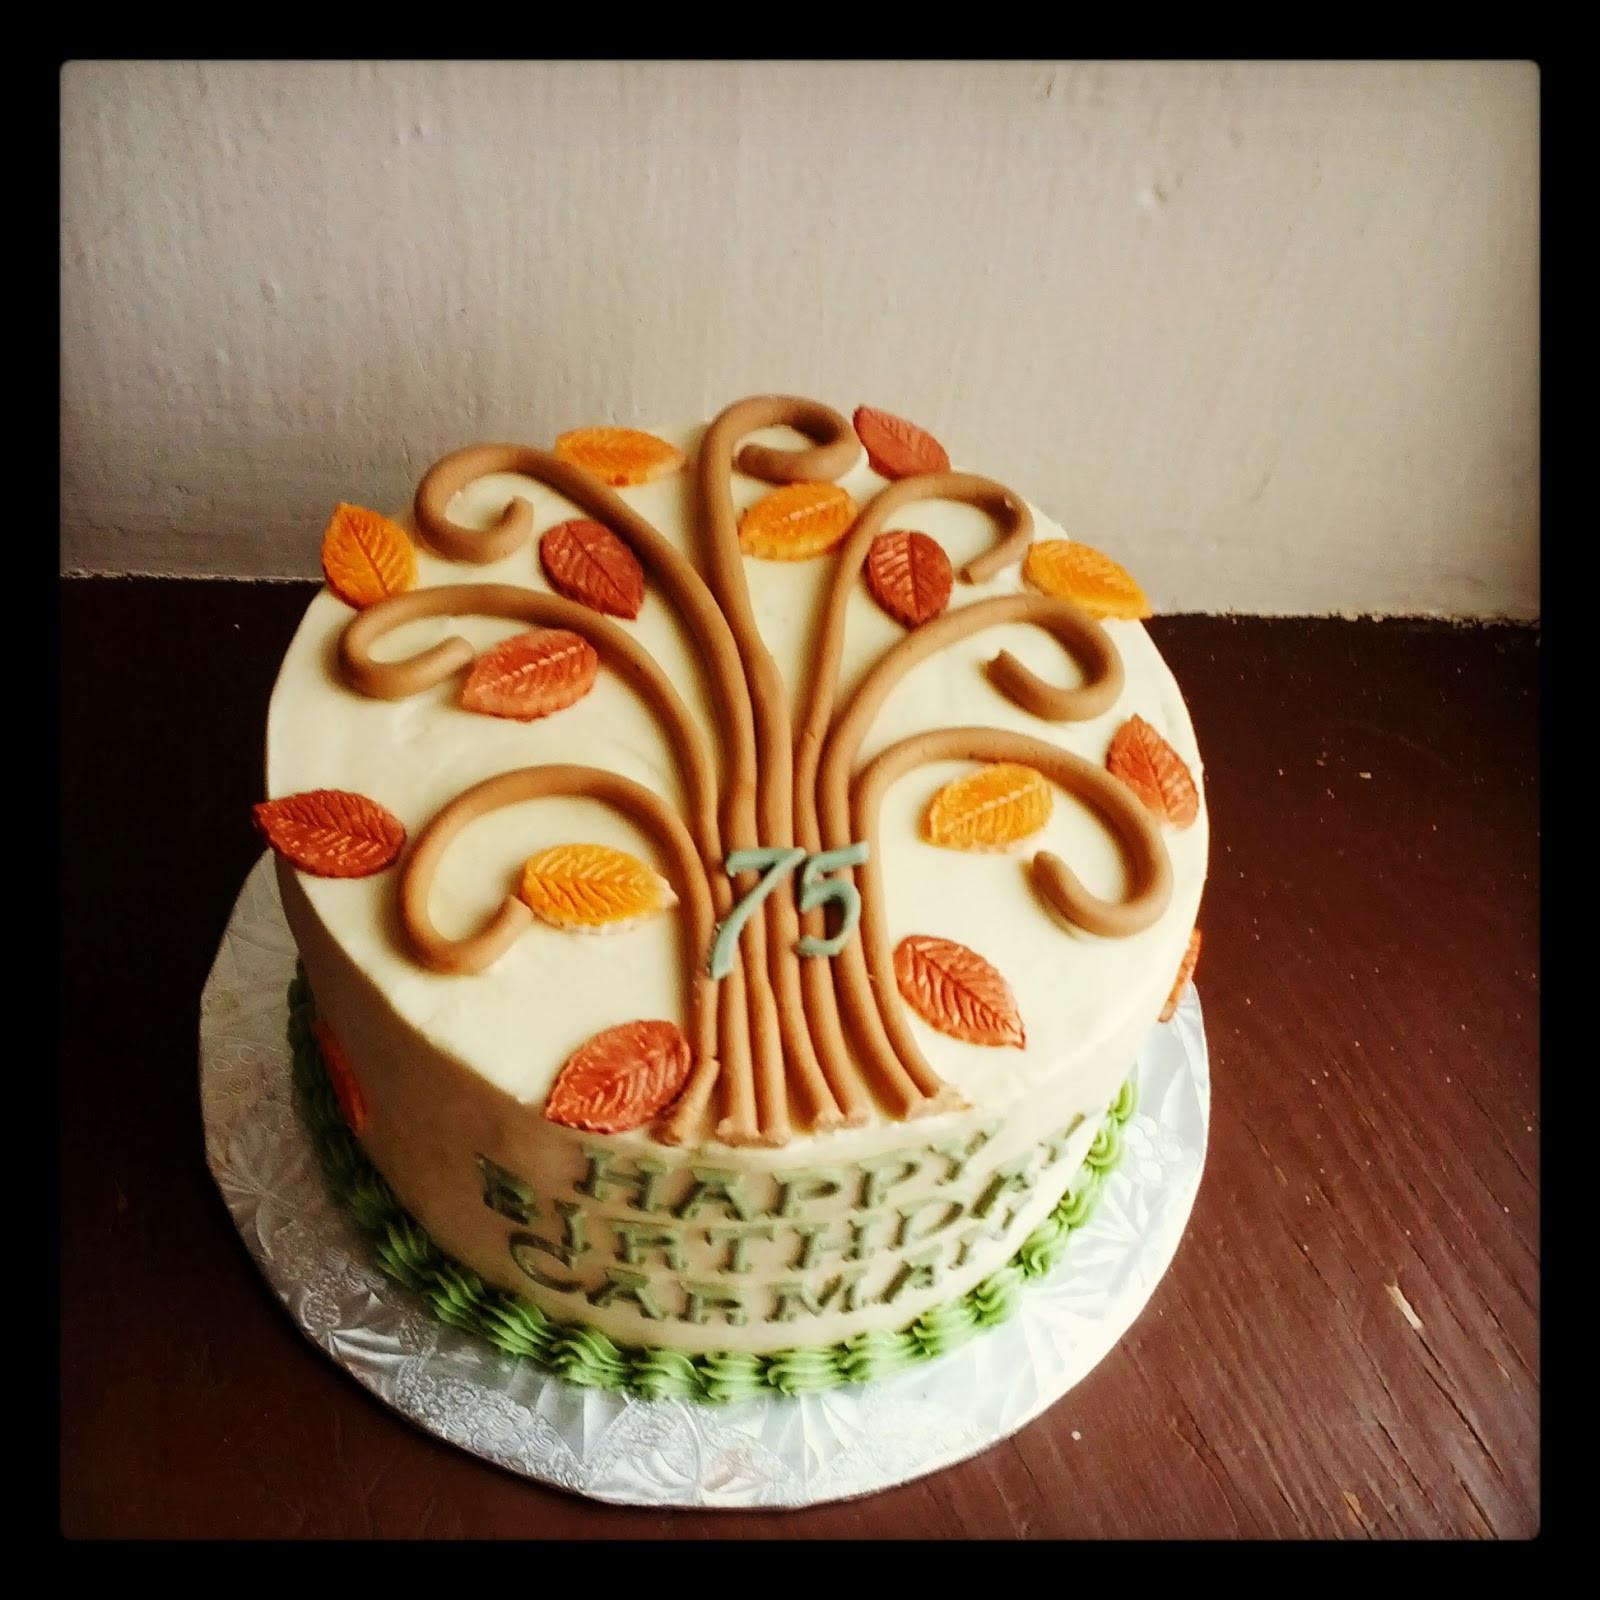 Fall Birthday Cake Ideas  Second Generation Cake Design Fall Themed Birthday Cake